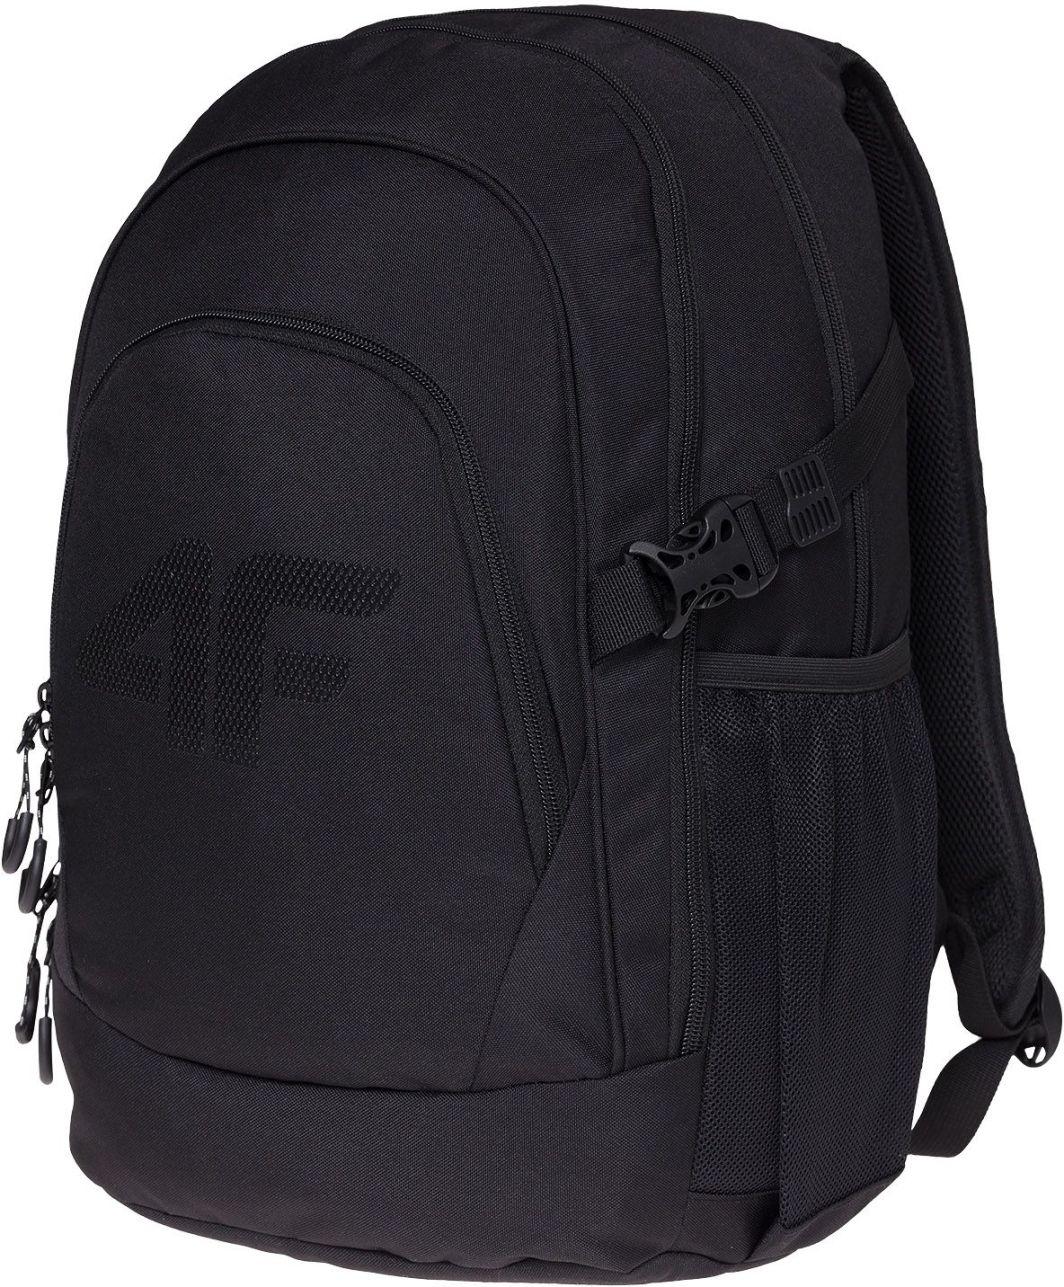 7e503ad1ecba2b 4f Plecak sportowy H4L18-PCU014 30L czarny w Sklep-presto.pl